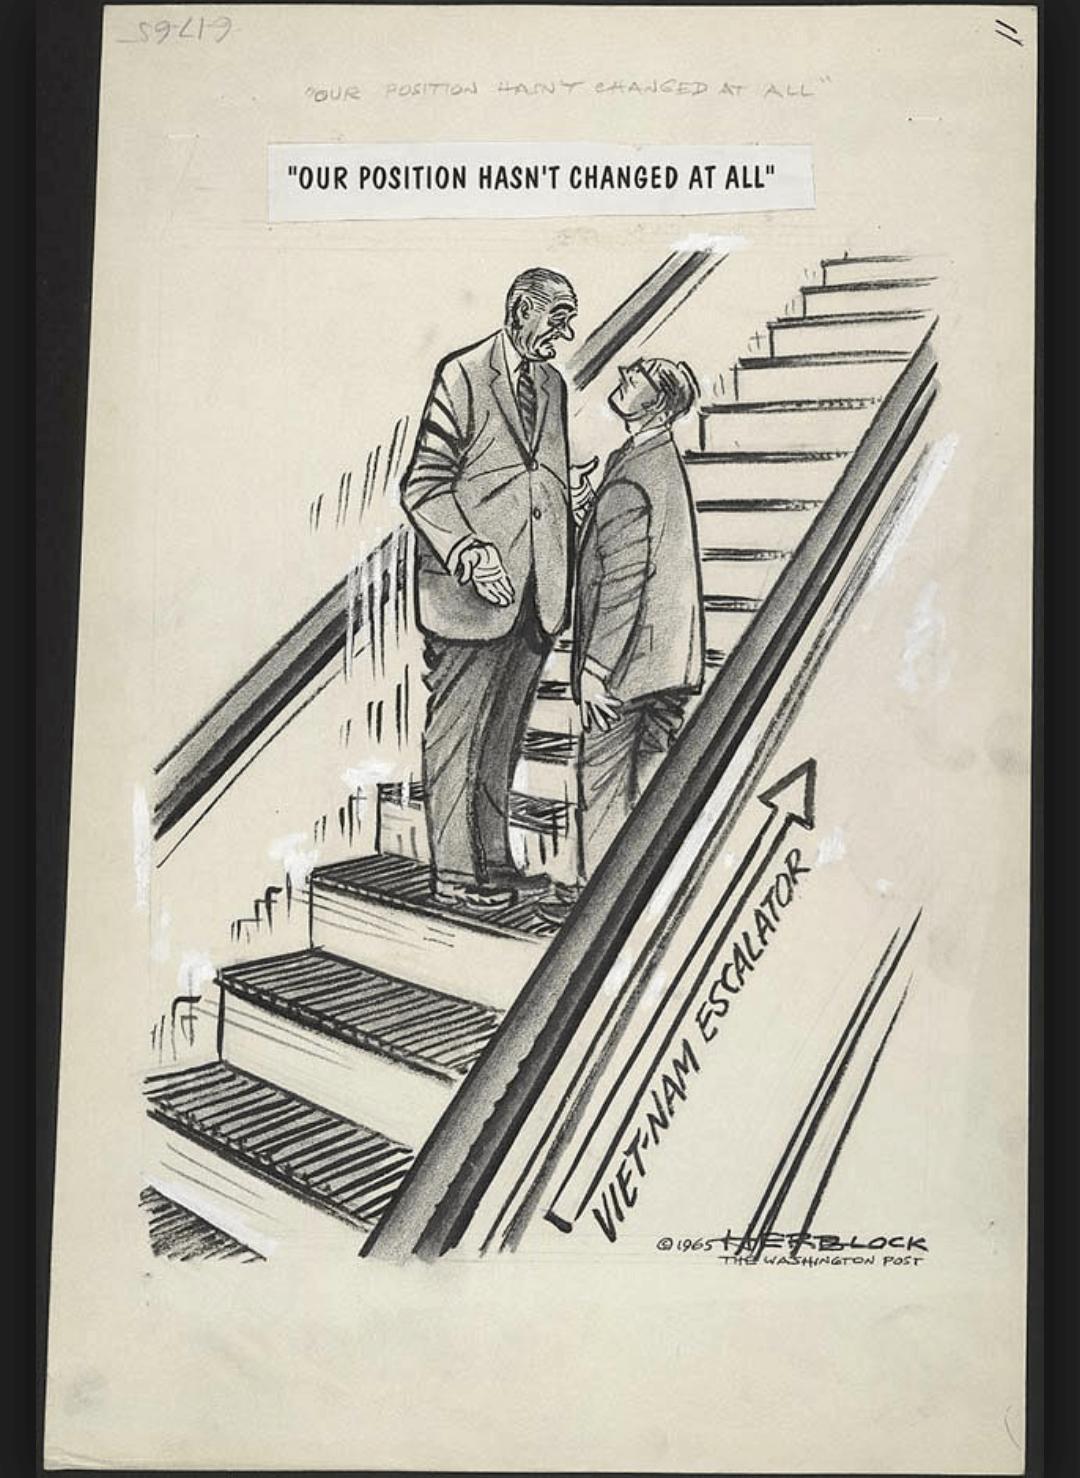 Worksheet Civil Rights Political Cartoon